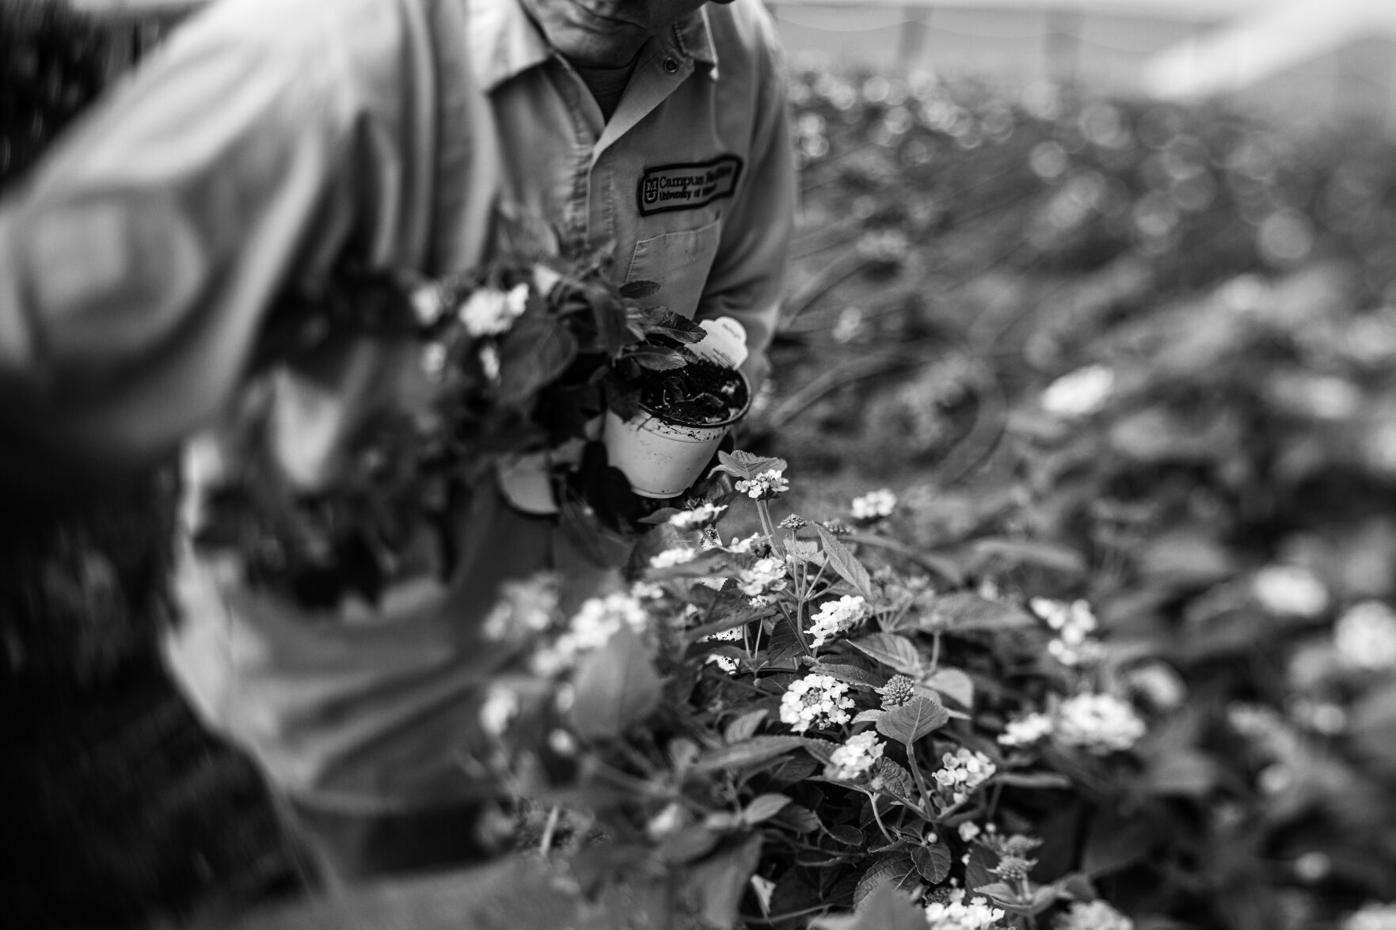 Andy Williams, groundskeeper at the University of Missouri, plants lantana